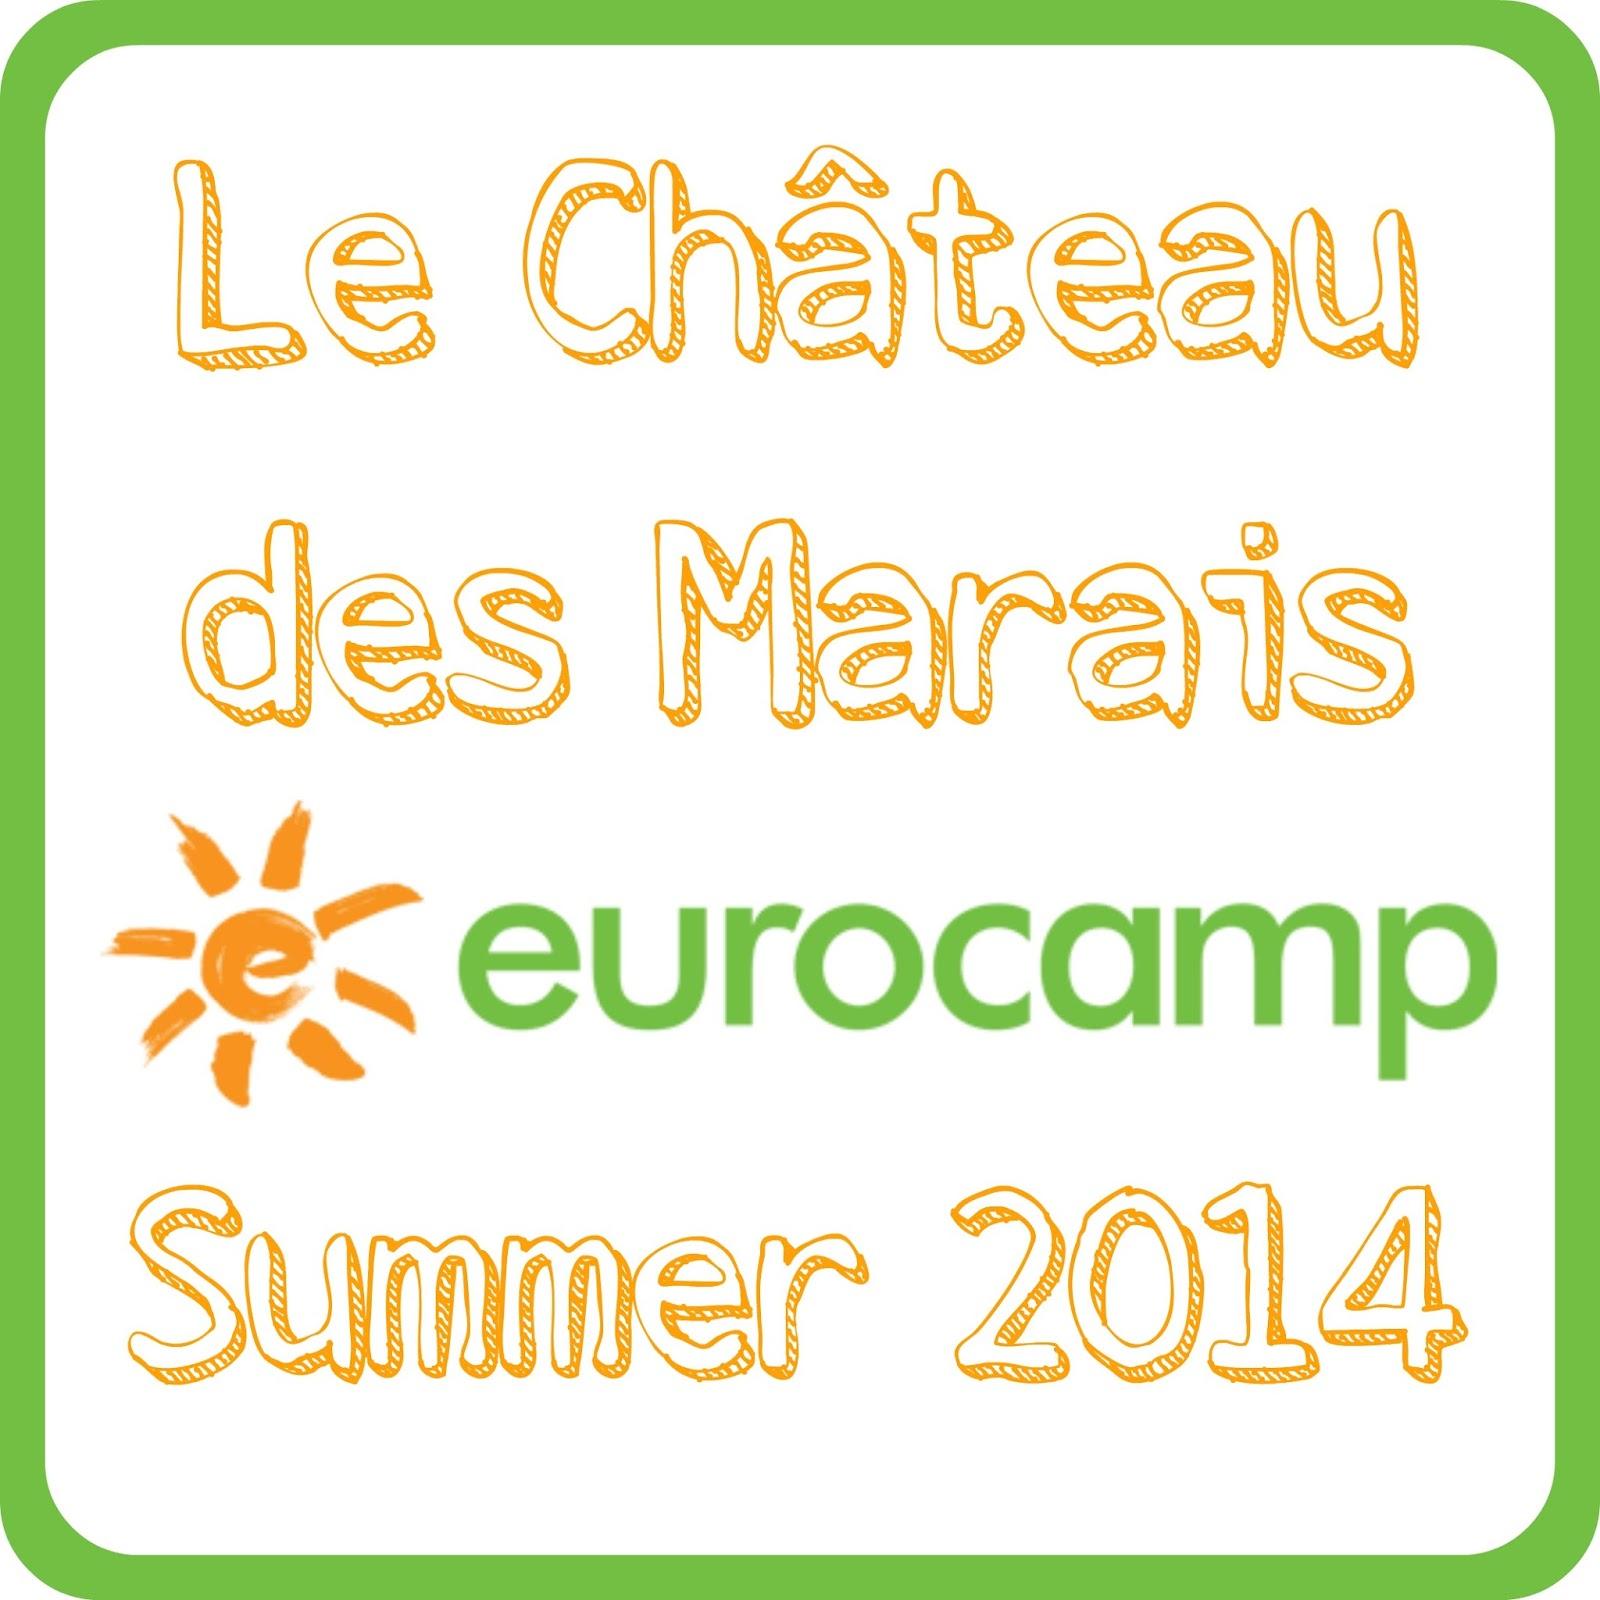 Le Château des Marais, Eurocamp, Summer 2014